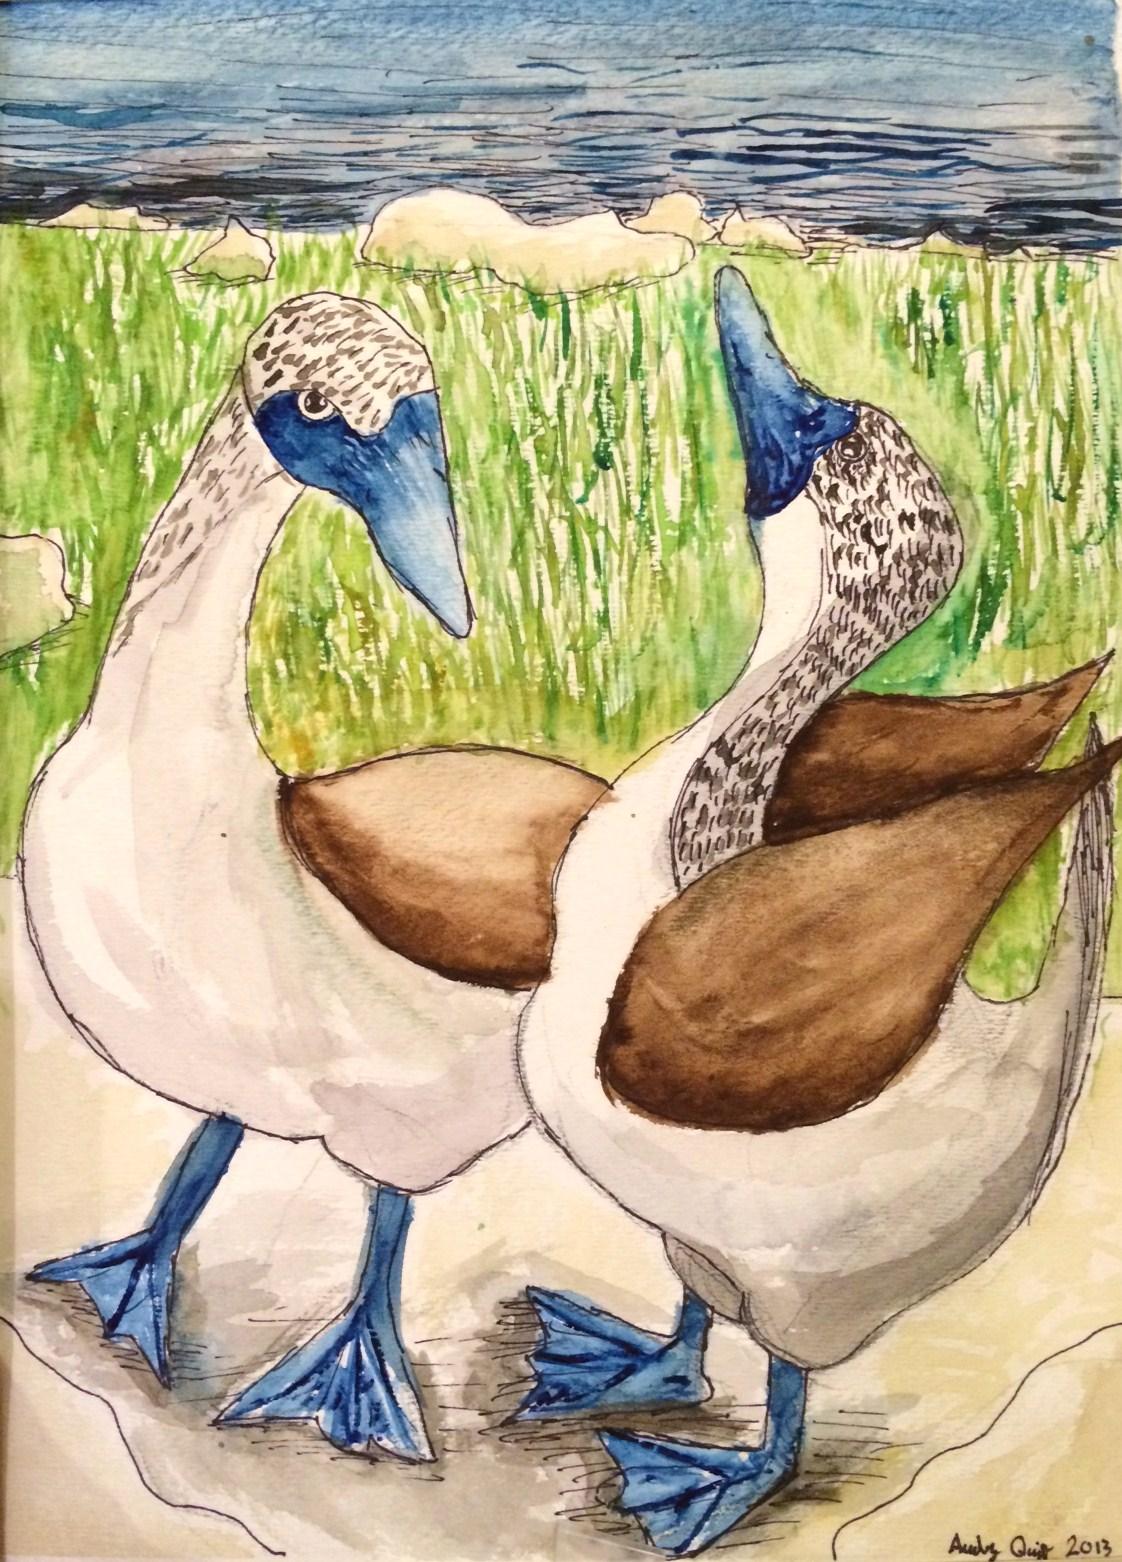 Audrey's ducks